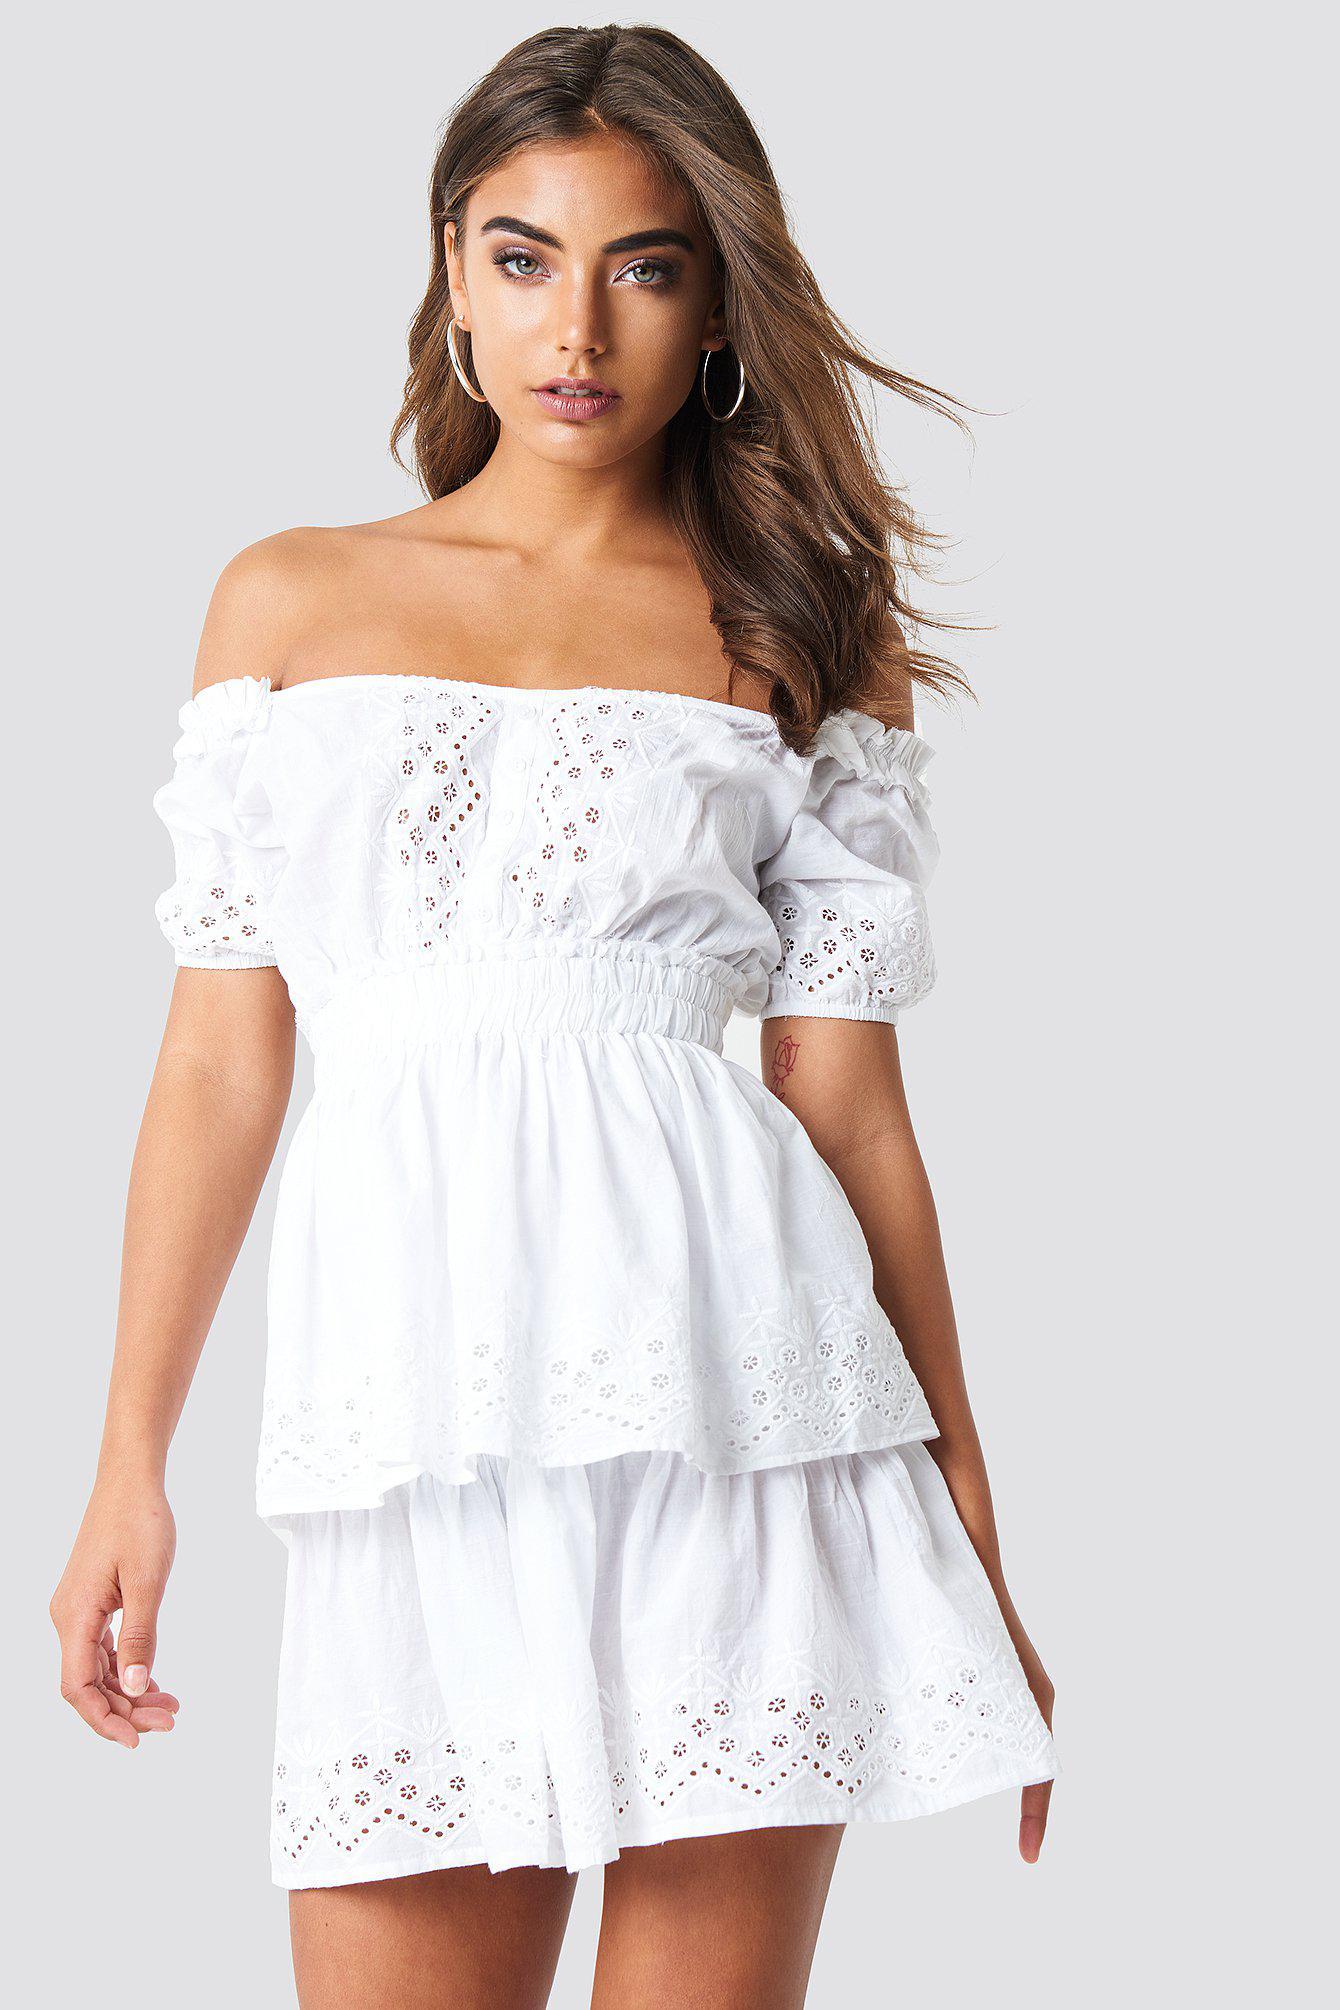 6bf627d55fdee NA-KD - Off Shoulder V Neck Crochet Frill Dress White - Lyst. View  fullscreen